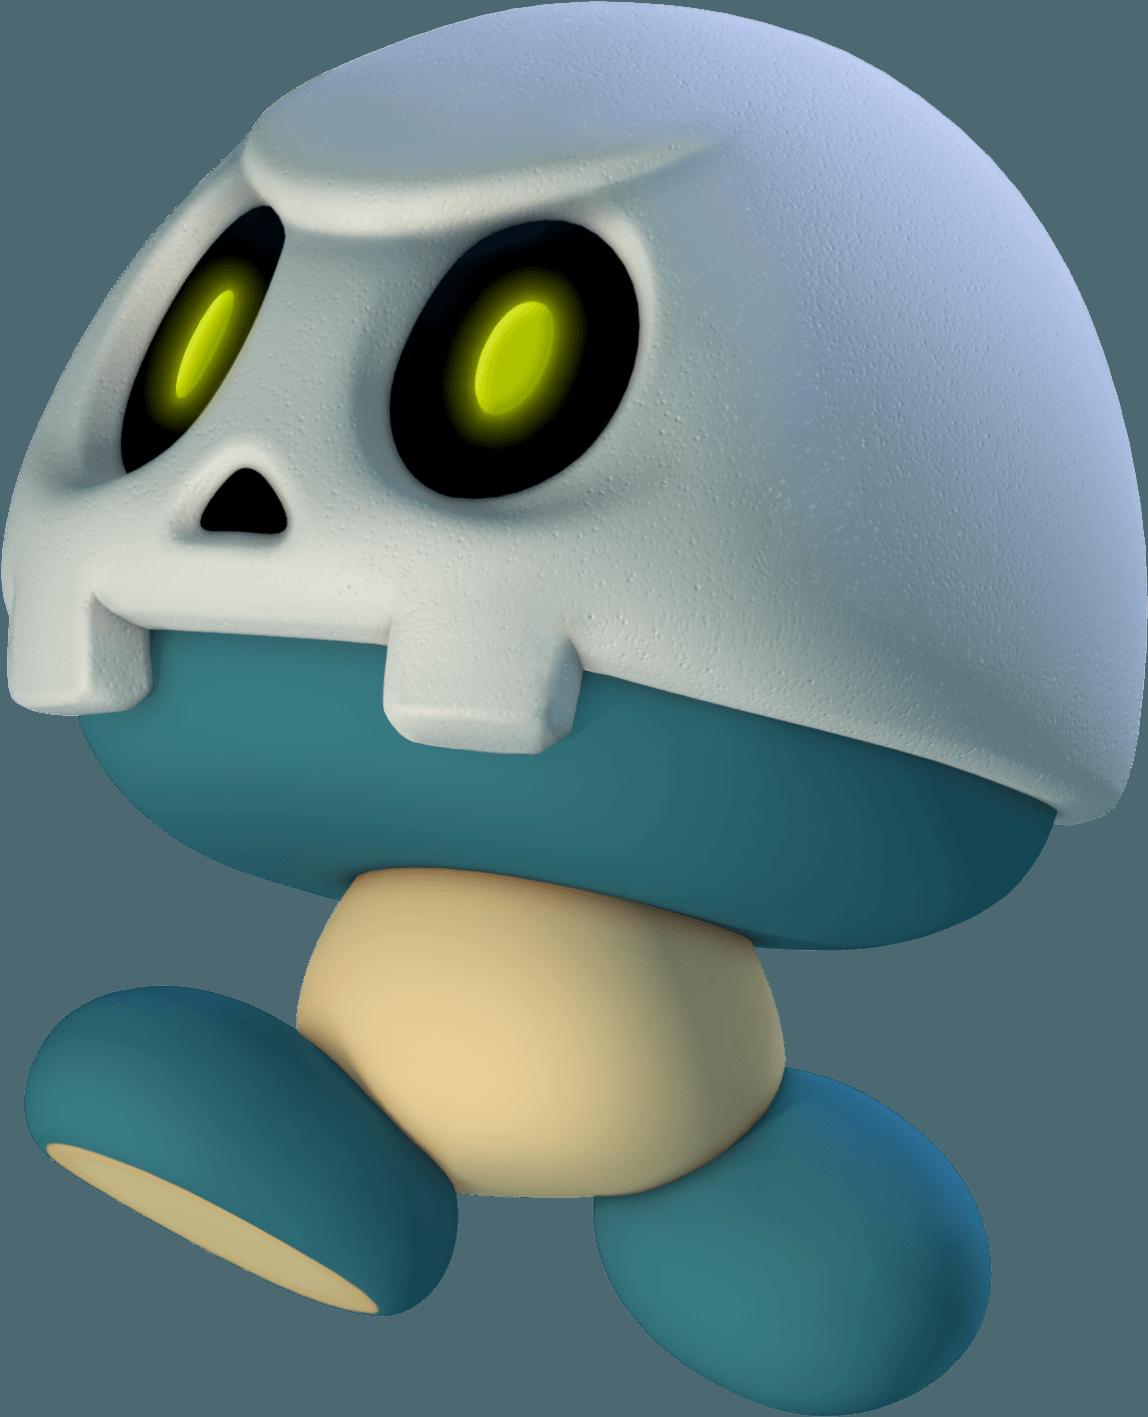 1148x1417 Bullet Clipart Super Mario Brothers